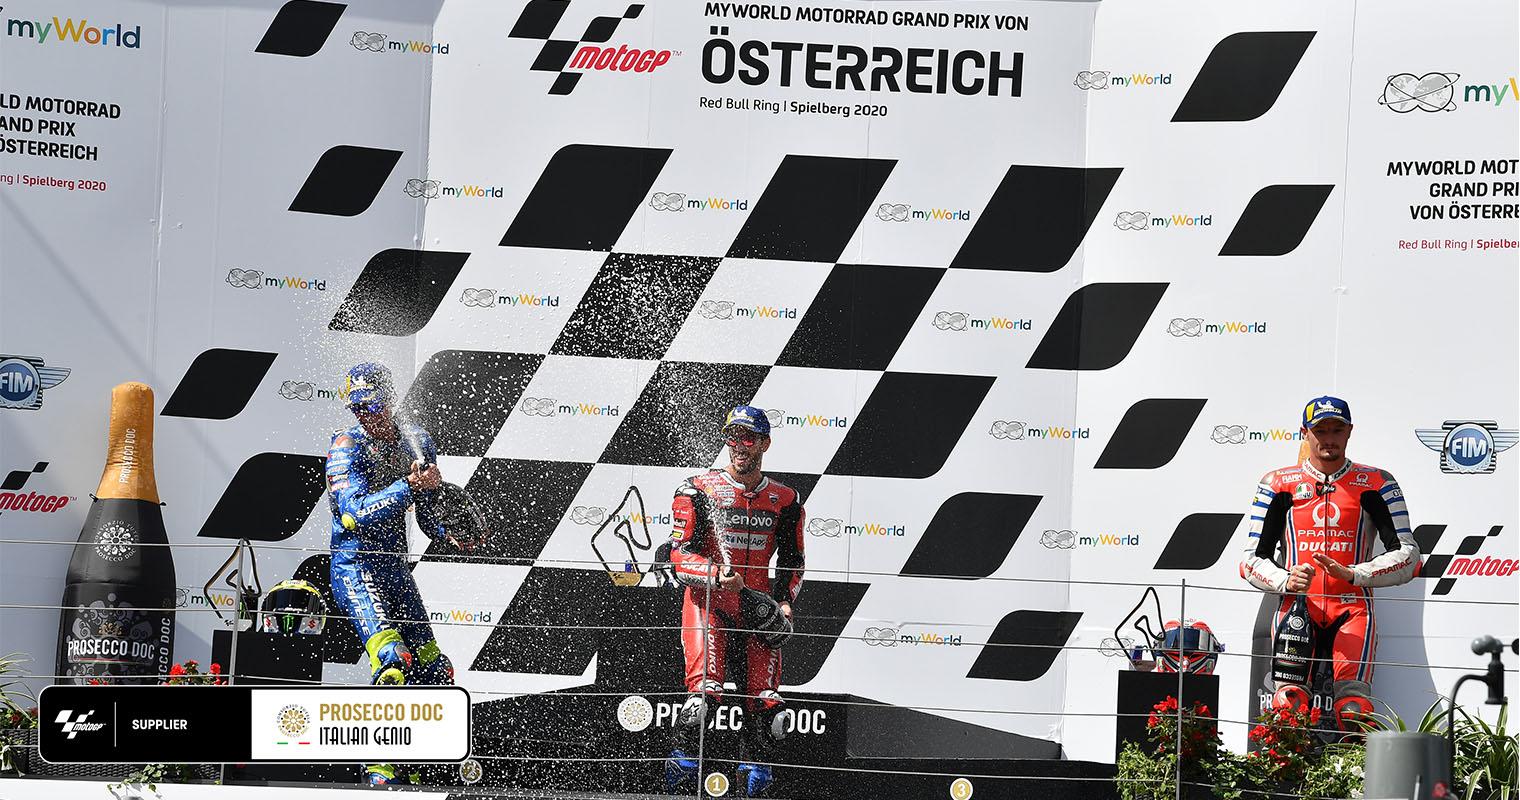 austria 1 podio